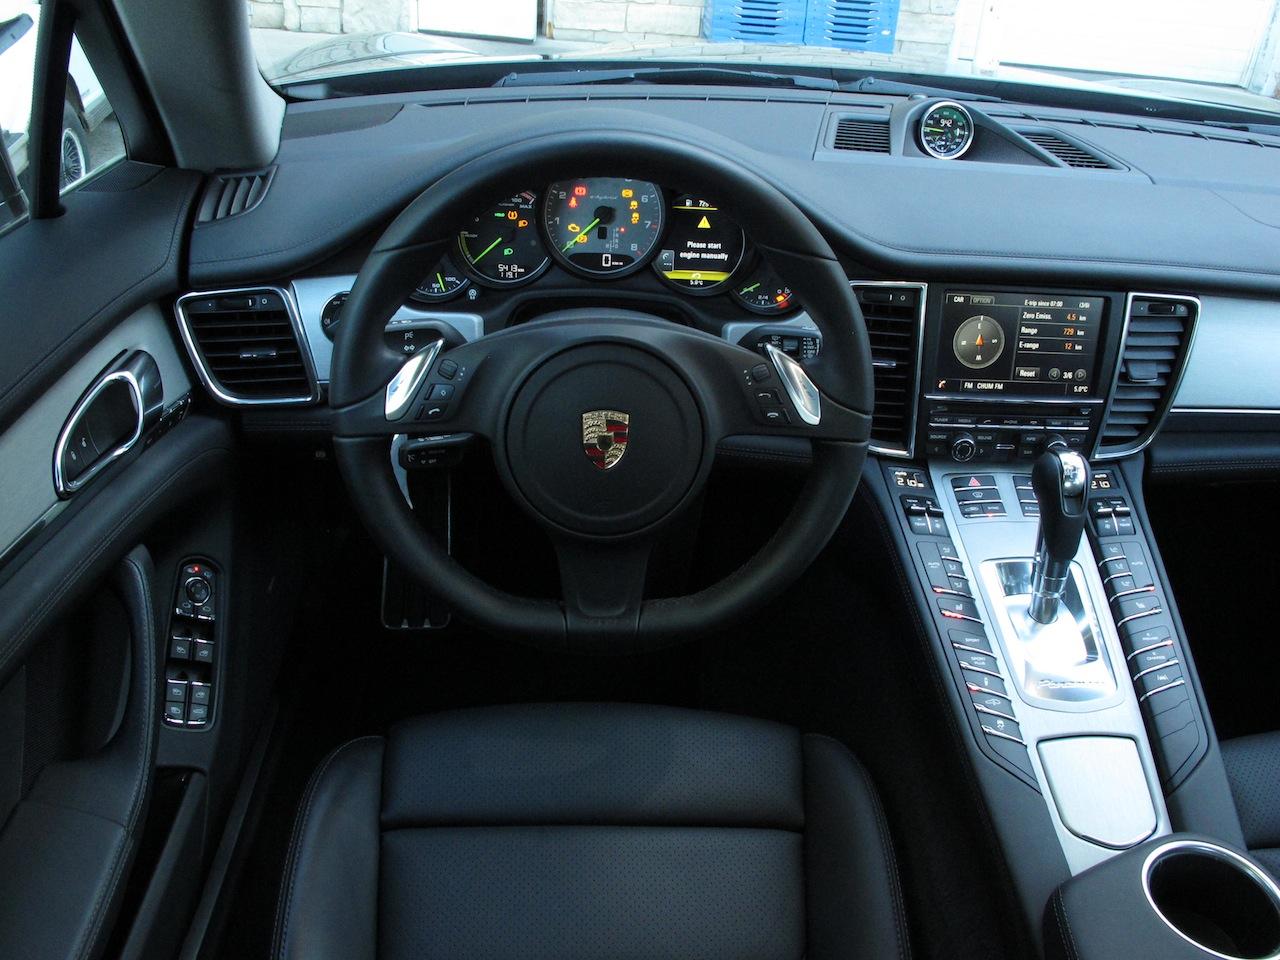 2014 Porsche Panamera S E Hybrid Black Interior Dashboard